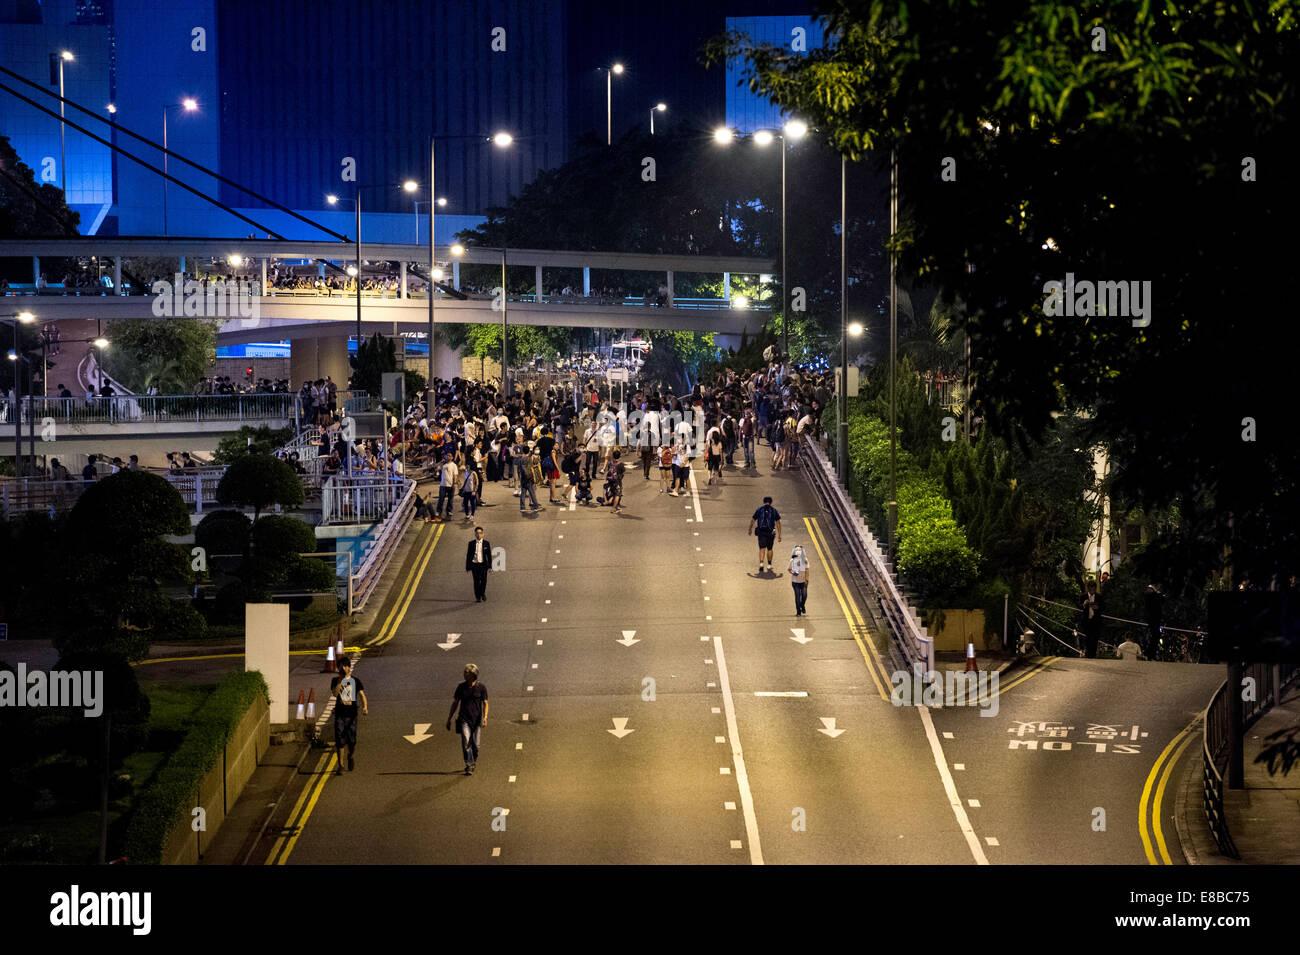 Pro-democracy  protest spread through Hong Kong. By Hong Kong Park Cotton Tree Drive Riot police congregate. - Stock Image